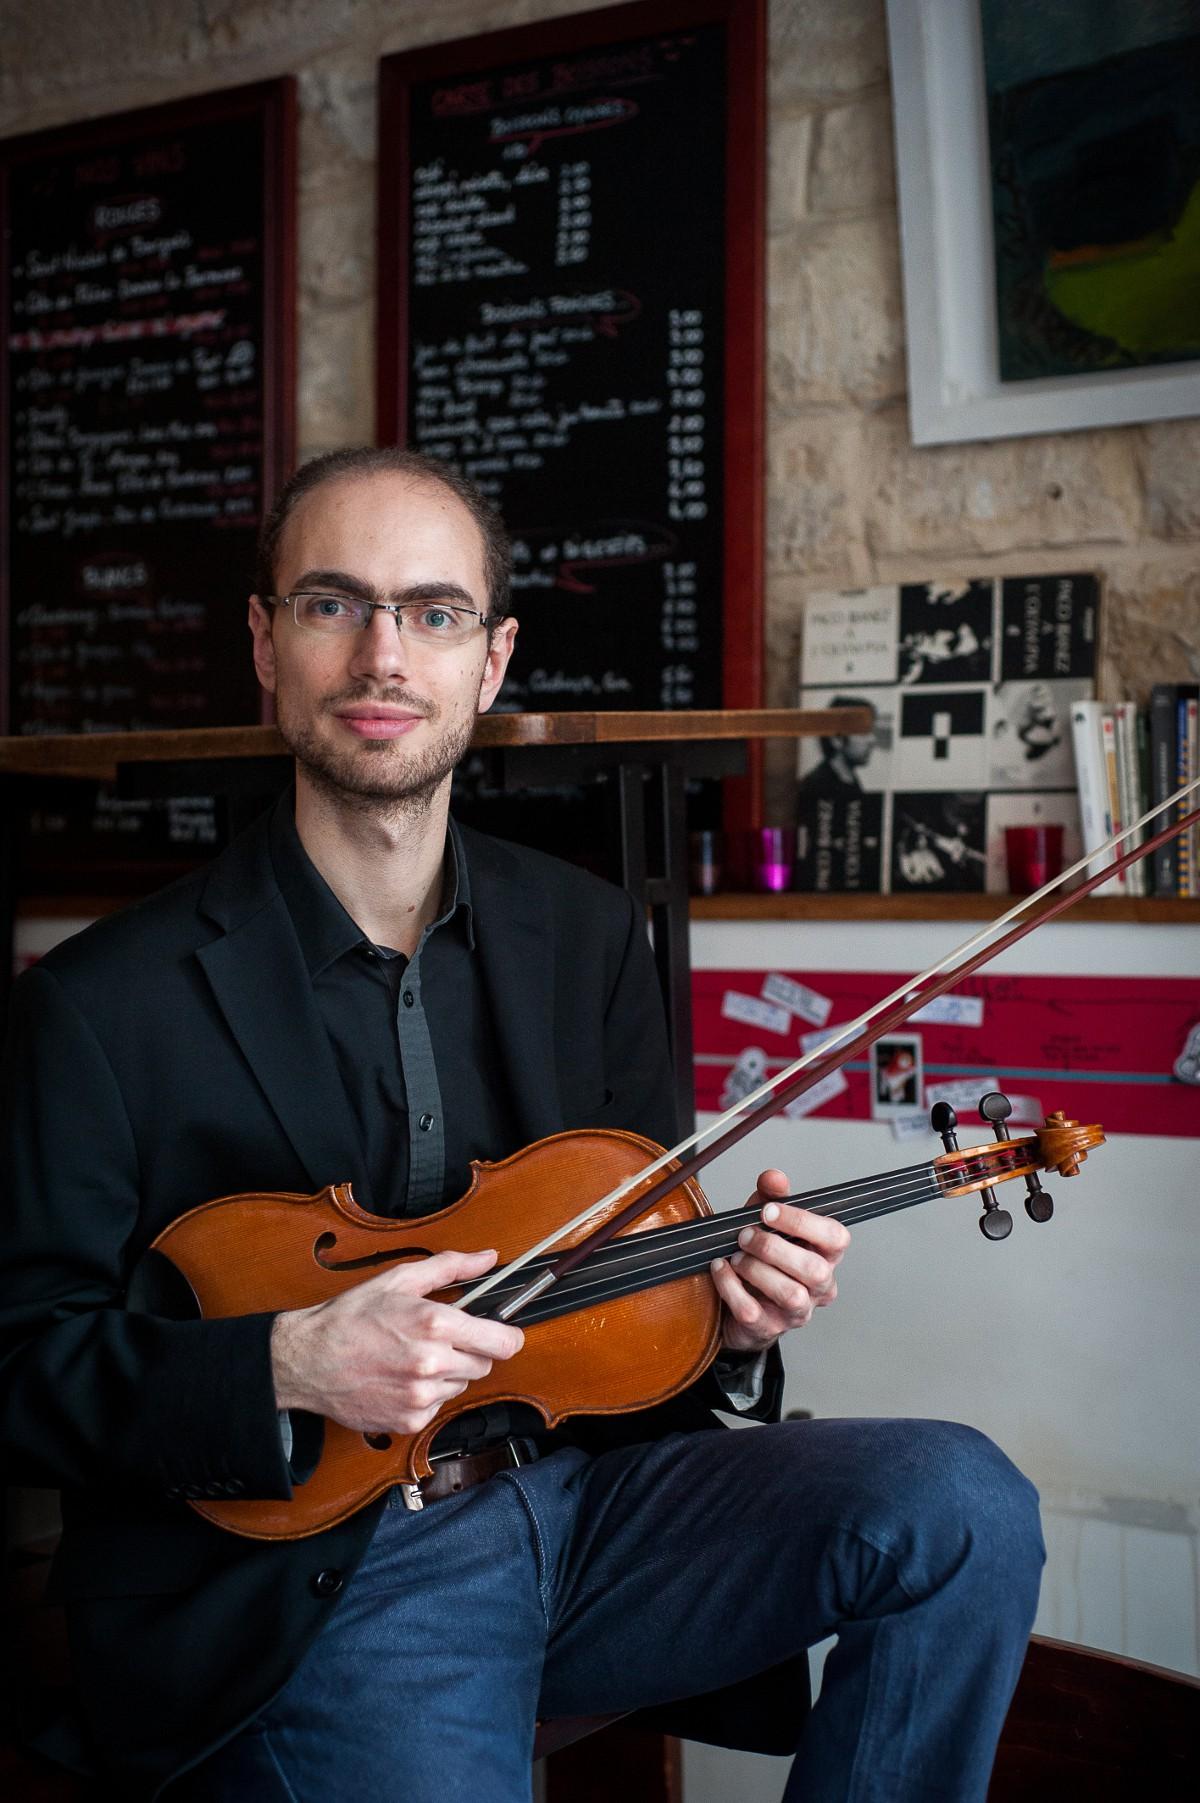 Nicolas Hussein